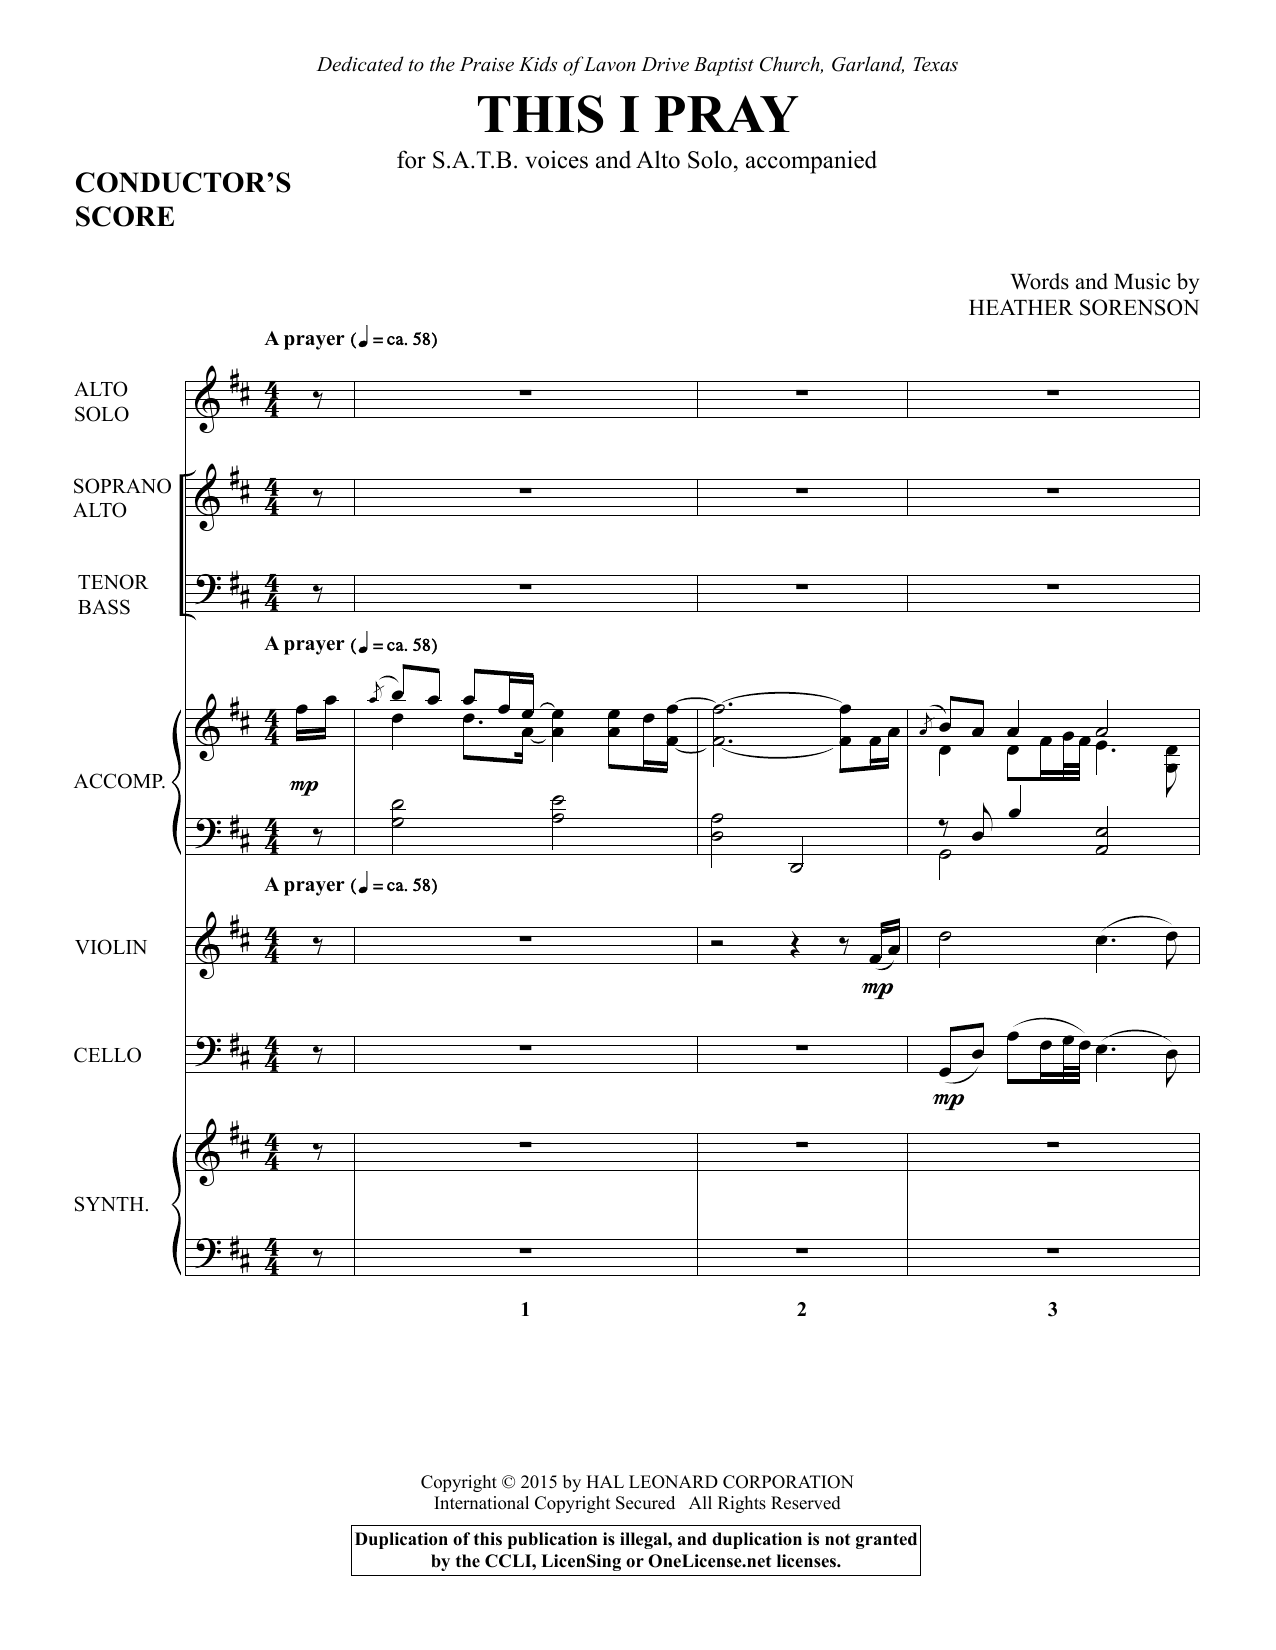 This I Pray - Full Score sheet music